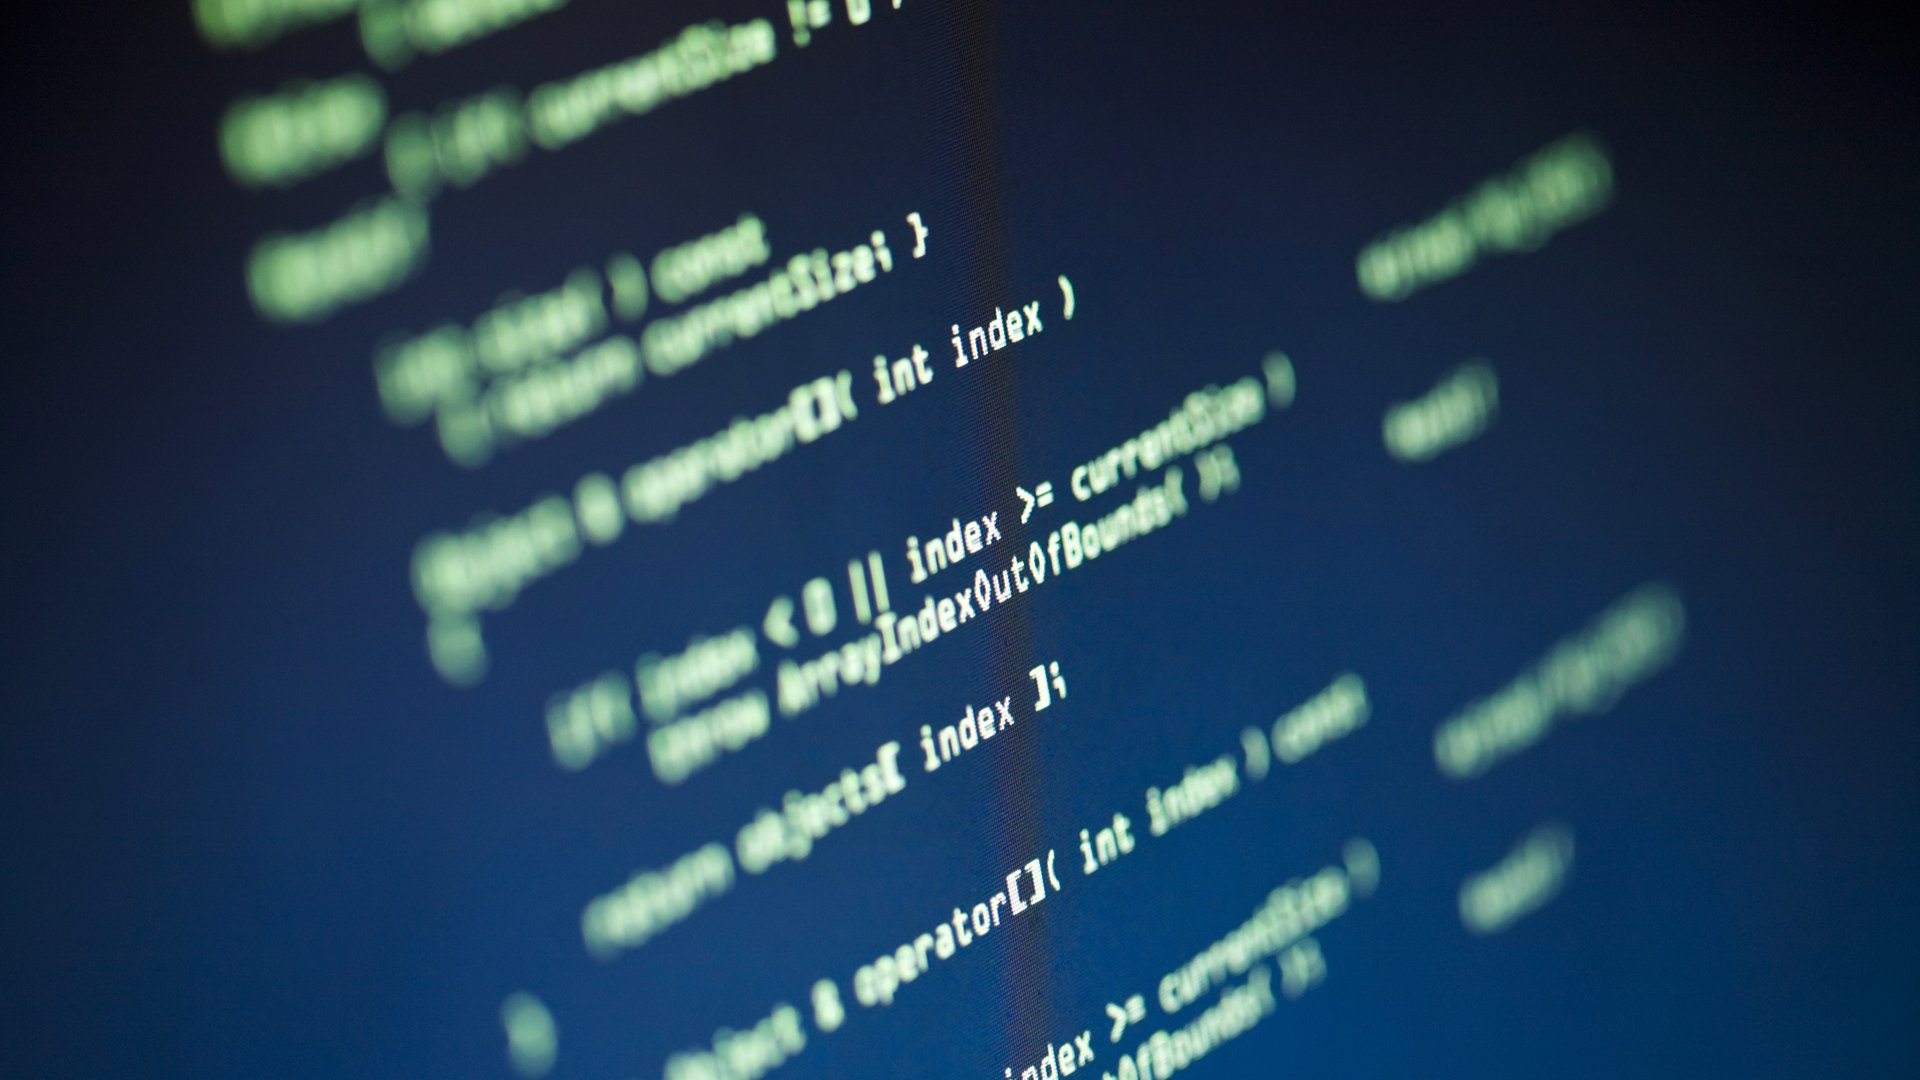 vt-cms-code.jpg